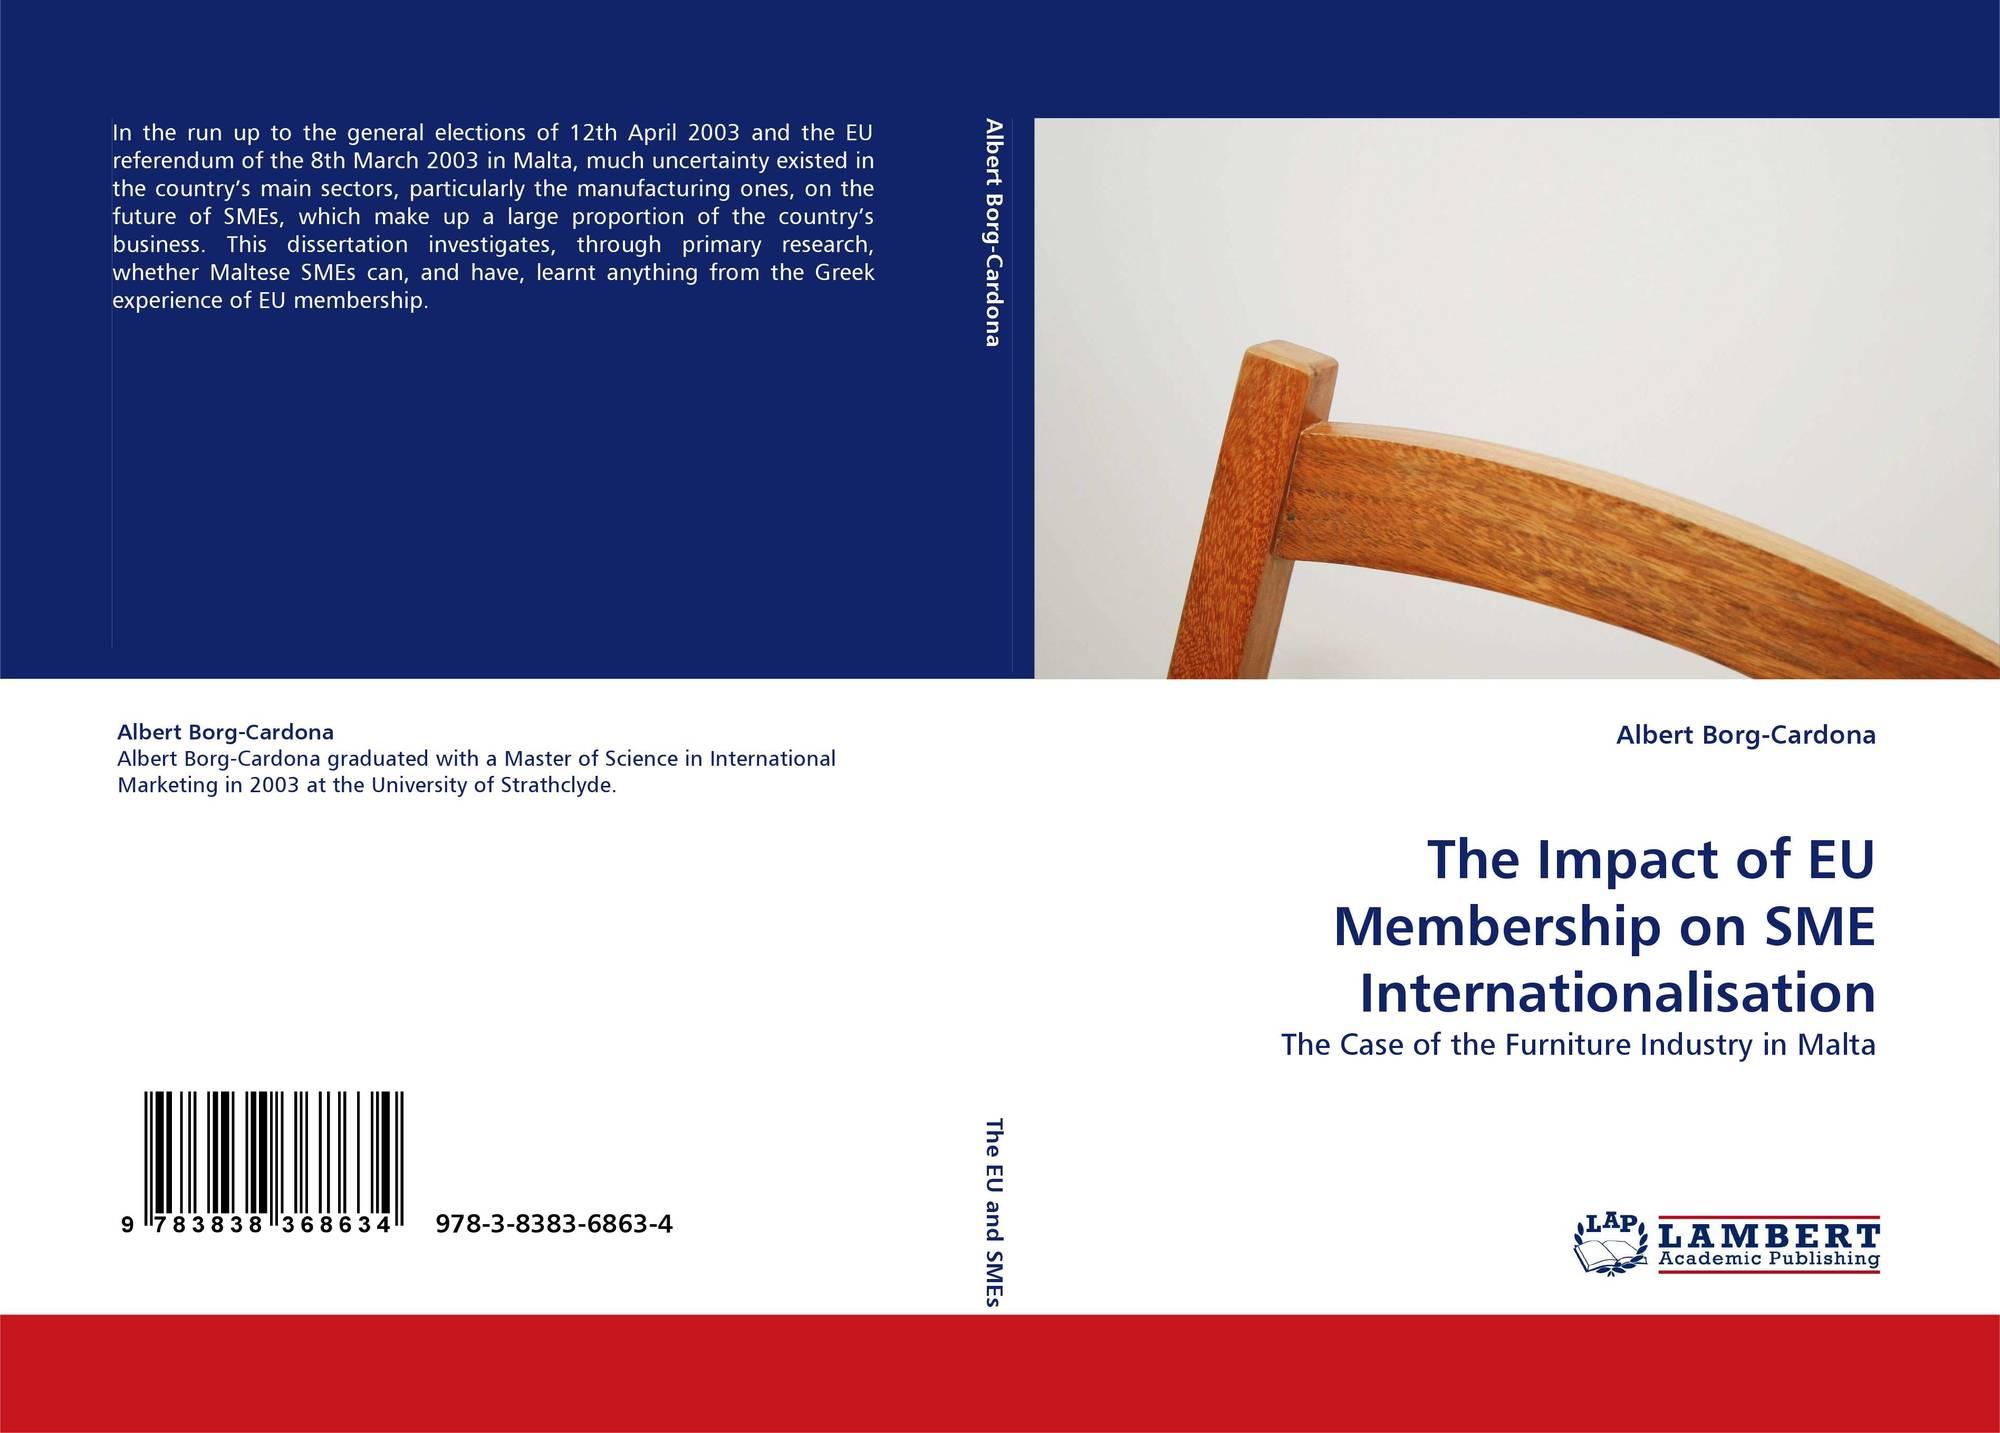 Dissertation consultation service binding